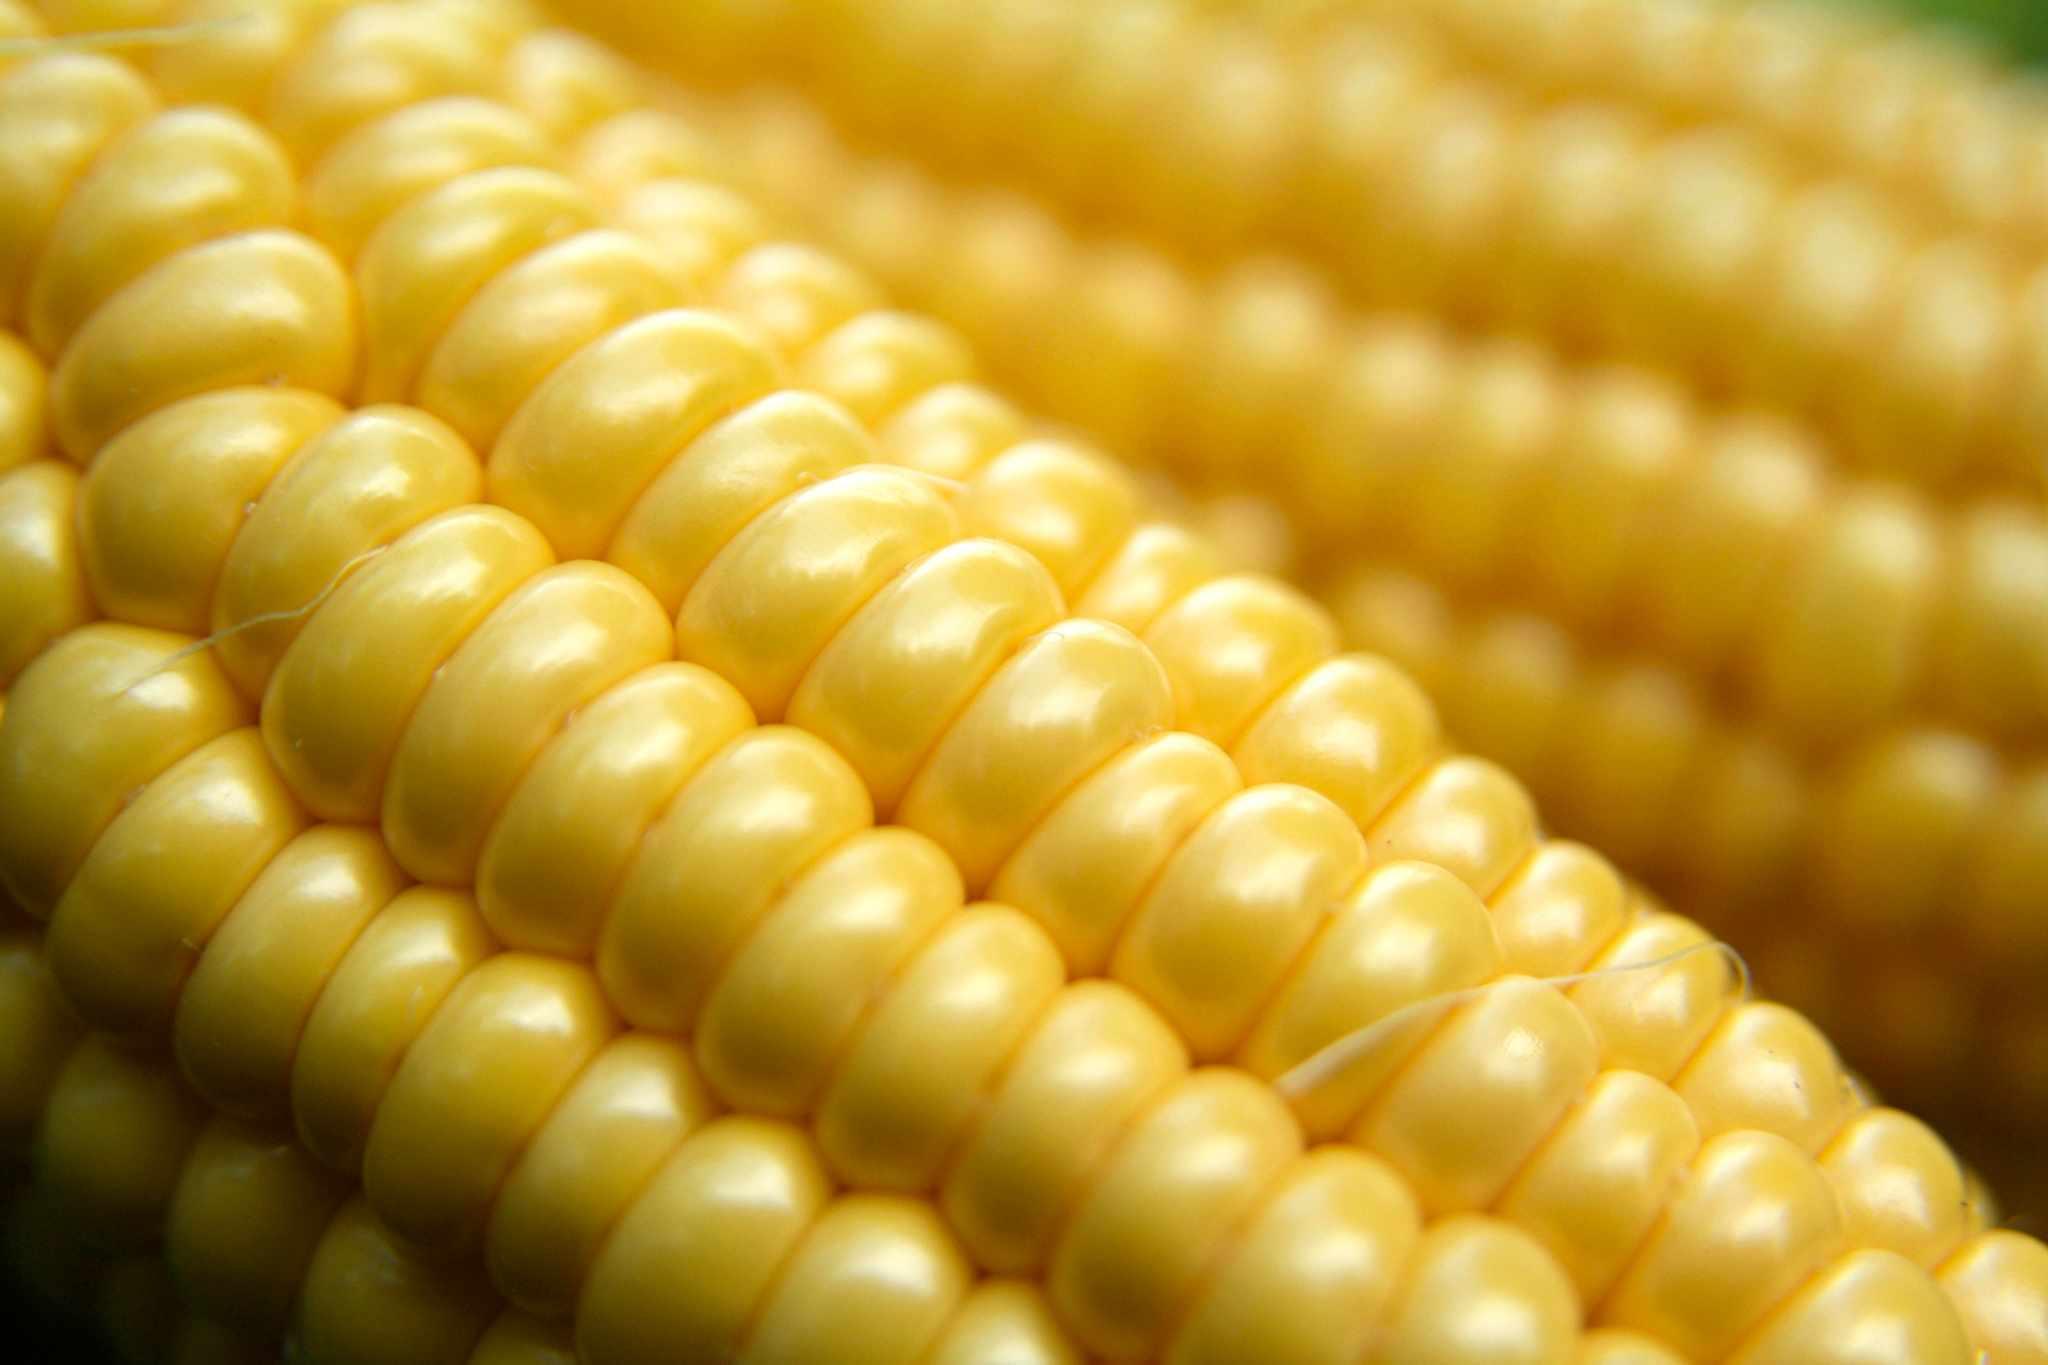 How to harvest sweetcorn